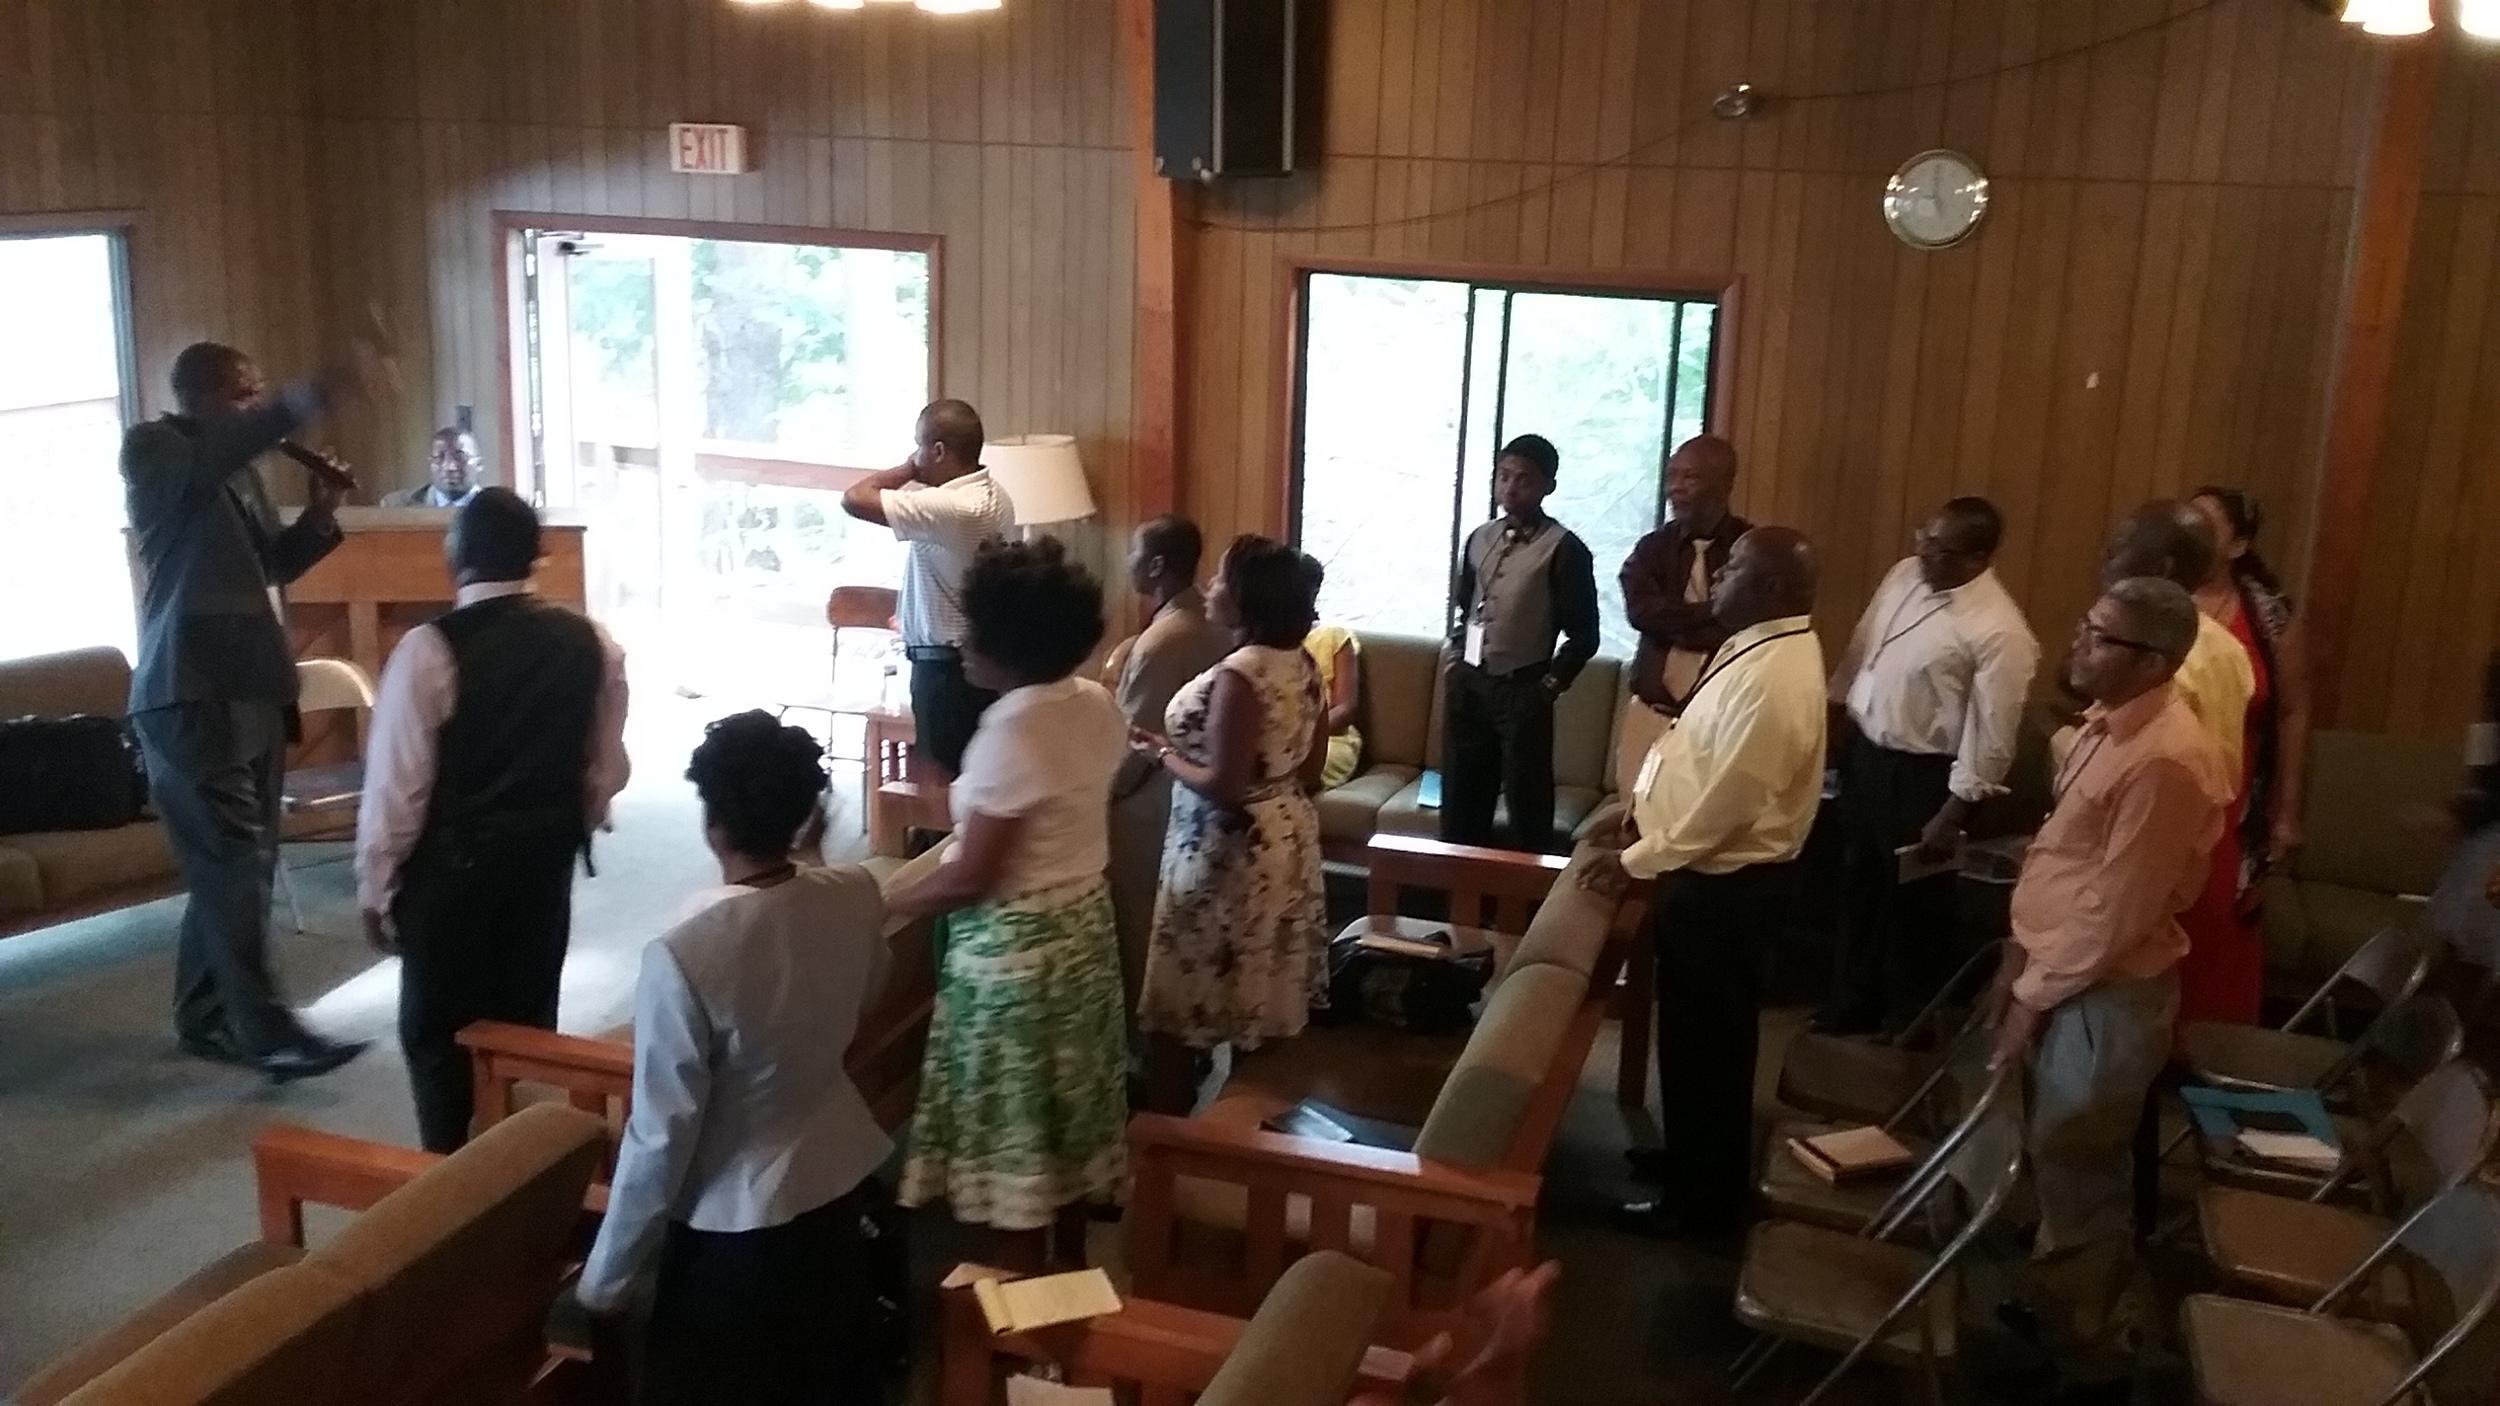 Haitian Creole training at Camp Winnekeag